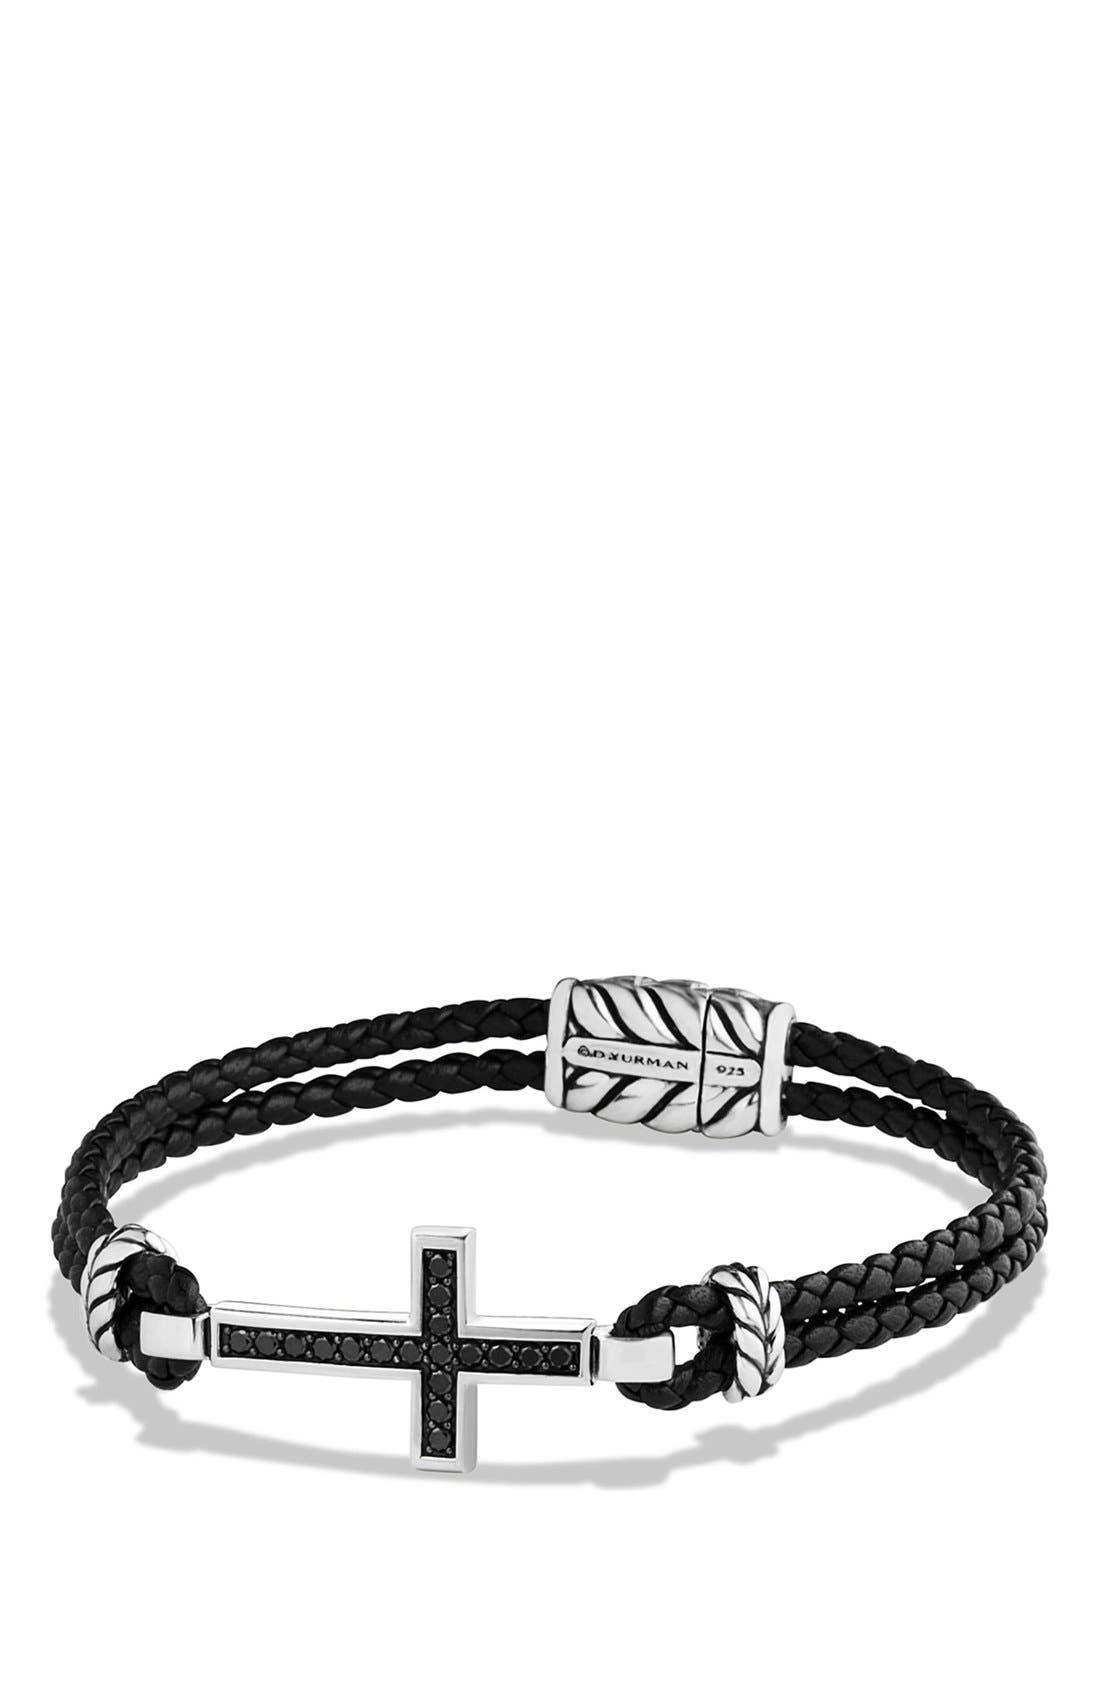 Pavé Cross Bracelet with Black Diamonds,                             Main thumbnail 1, color,                             BLACK DIAMOND